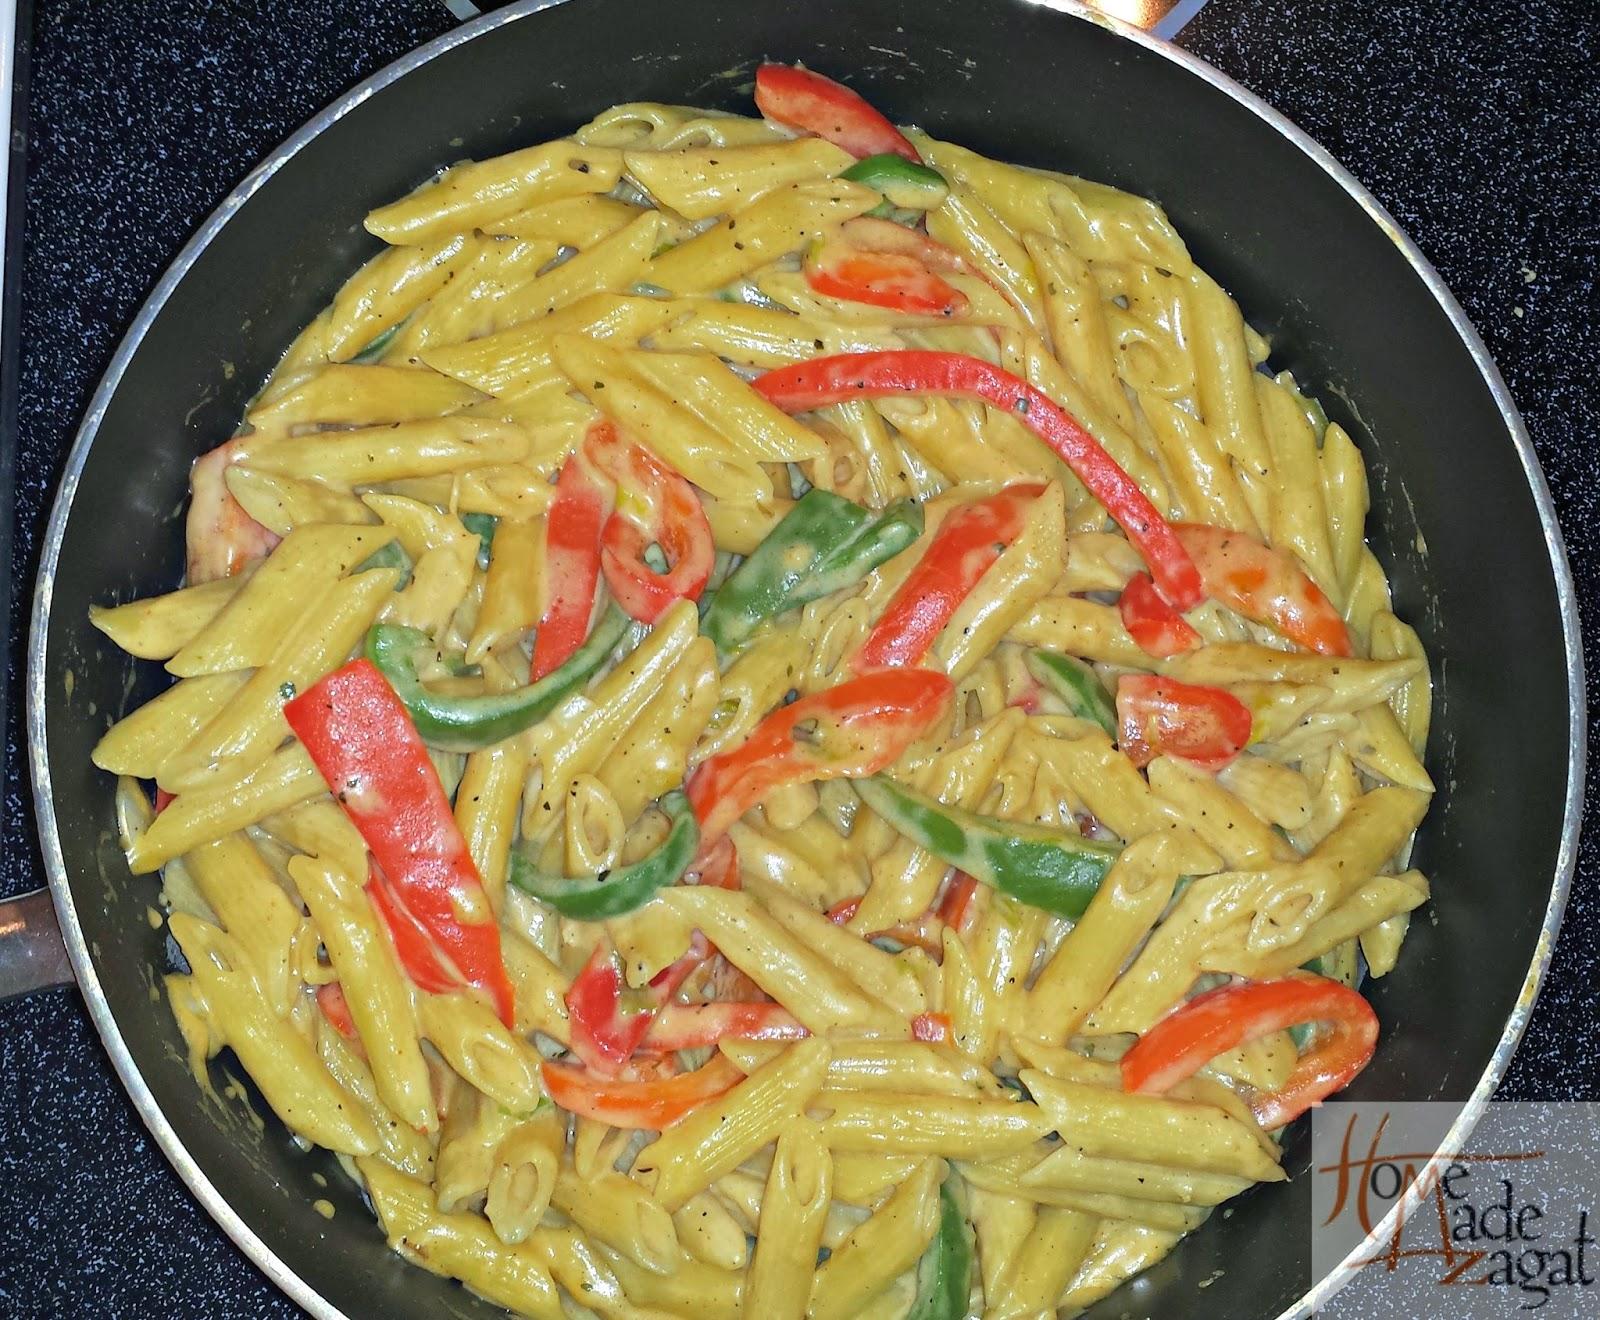 How to Make Rasta Pasta